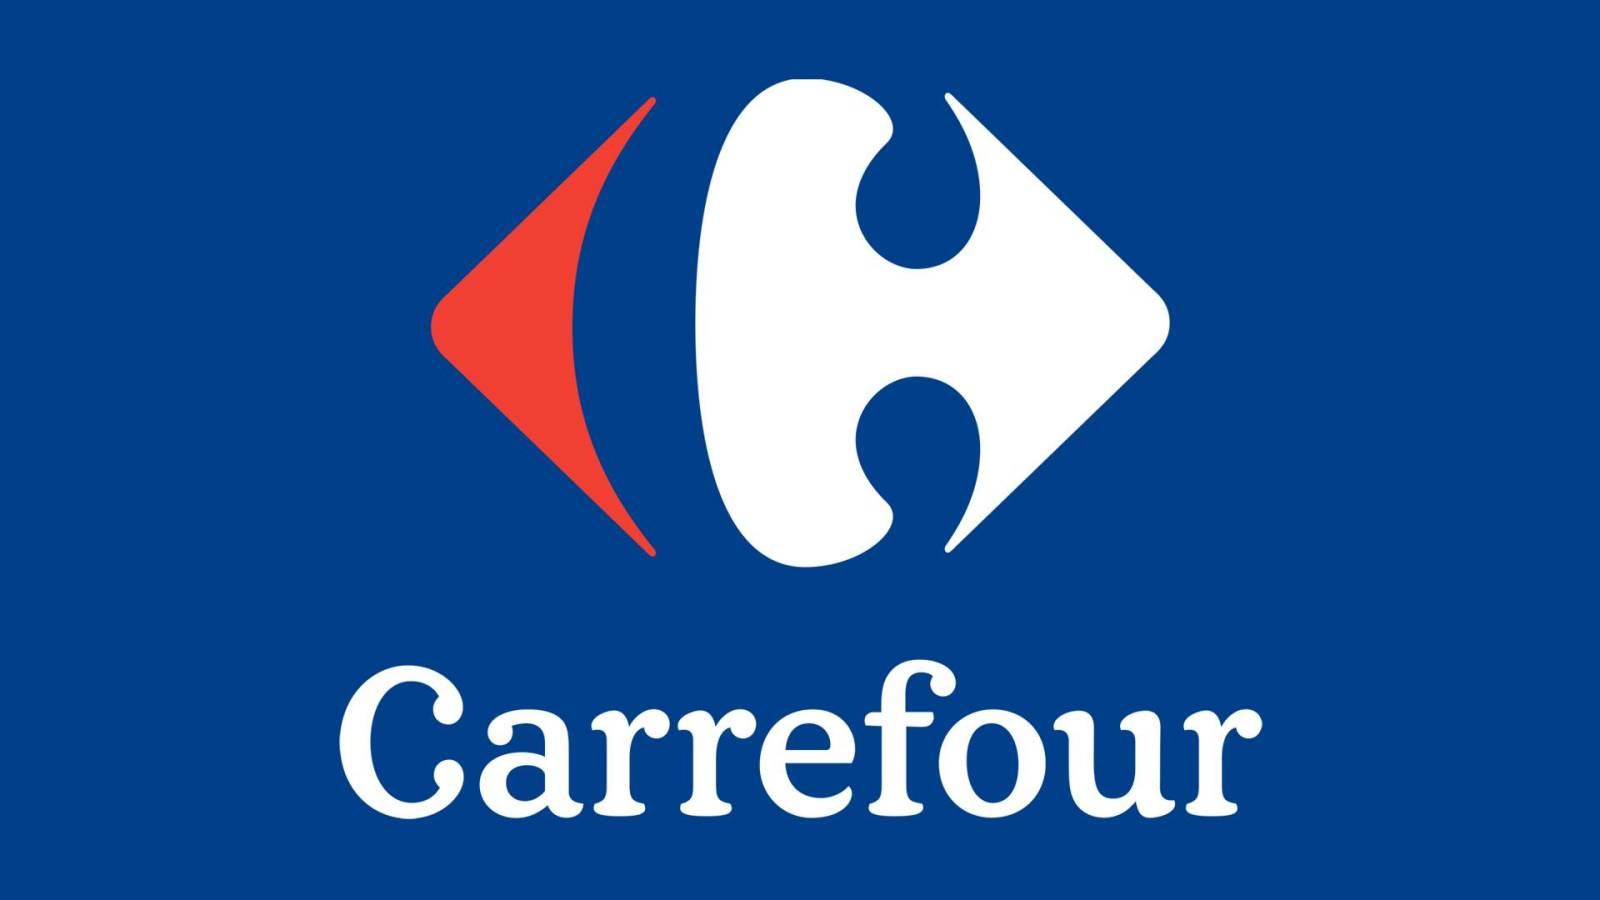 Carrefourfabine